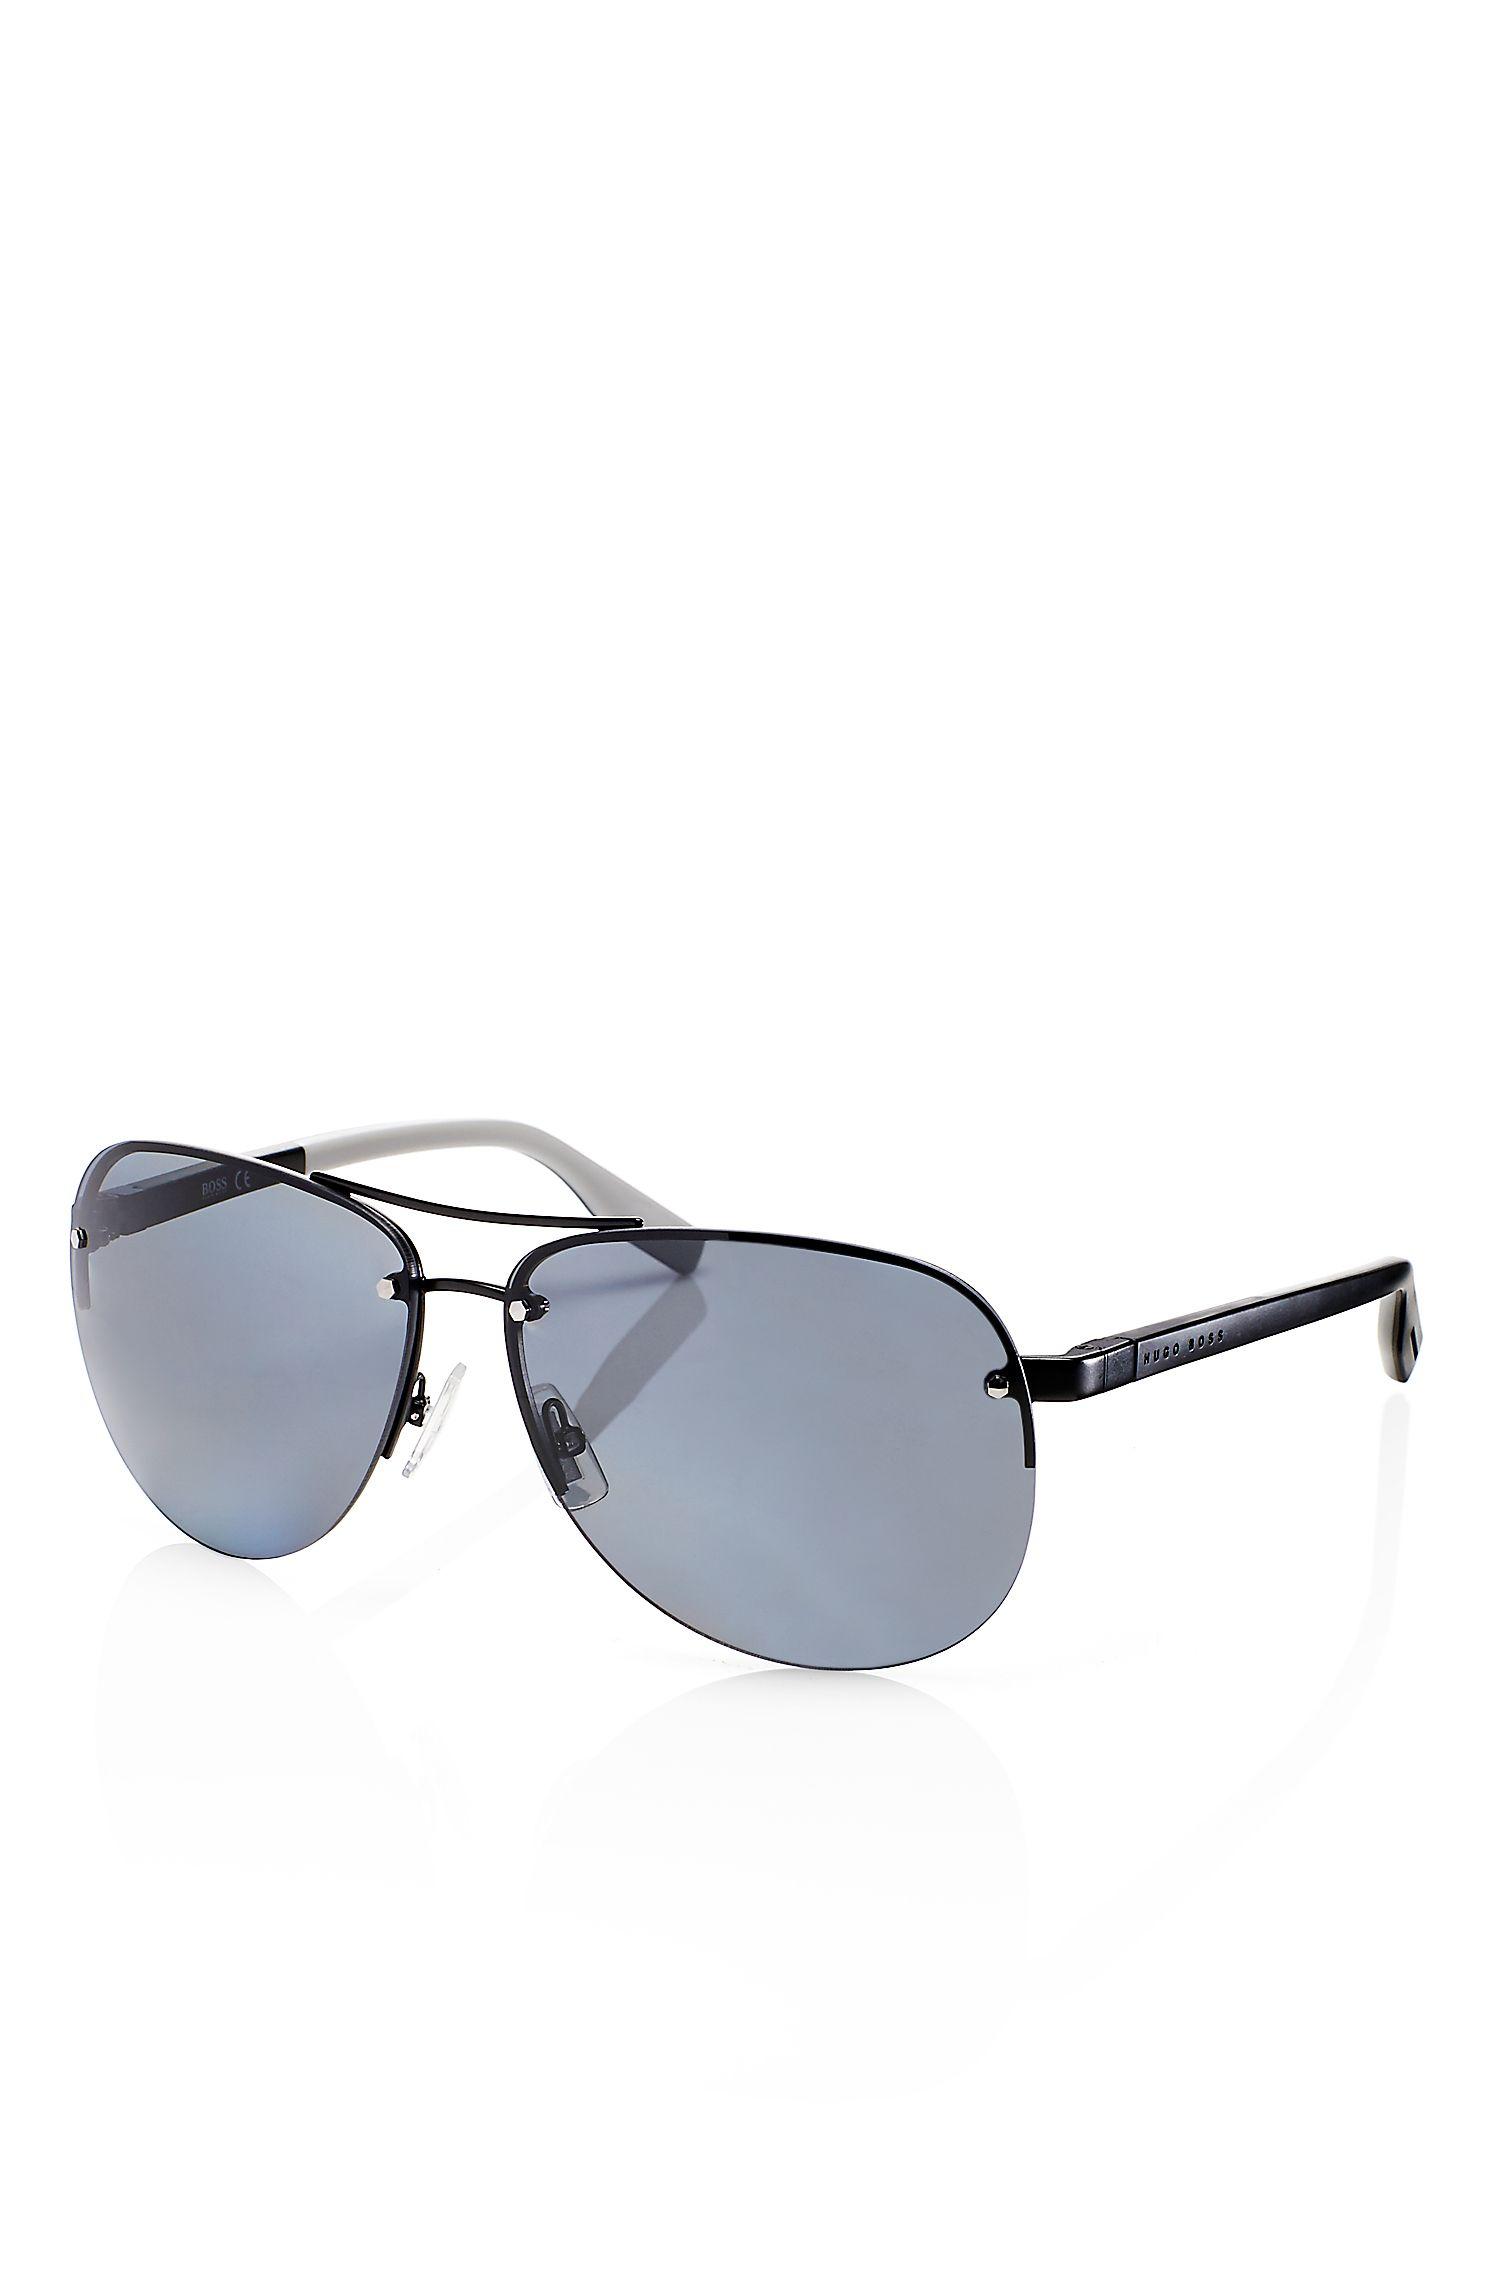 'Sunglasses' | Dark Ruthenium Rimless Aviator Sunglasses